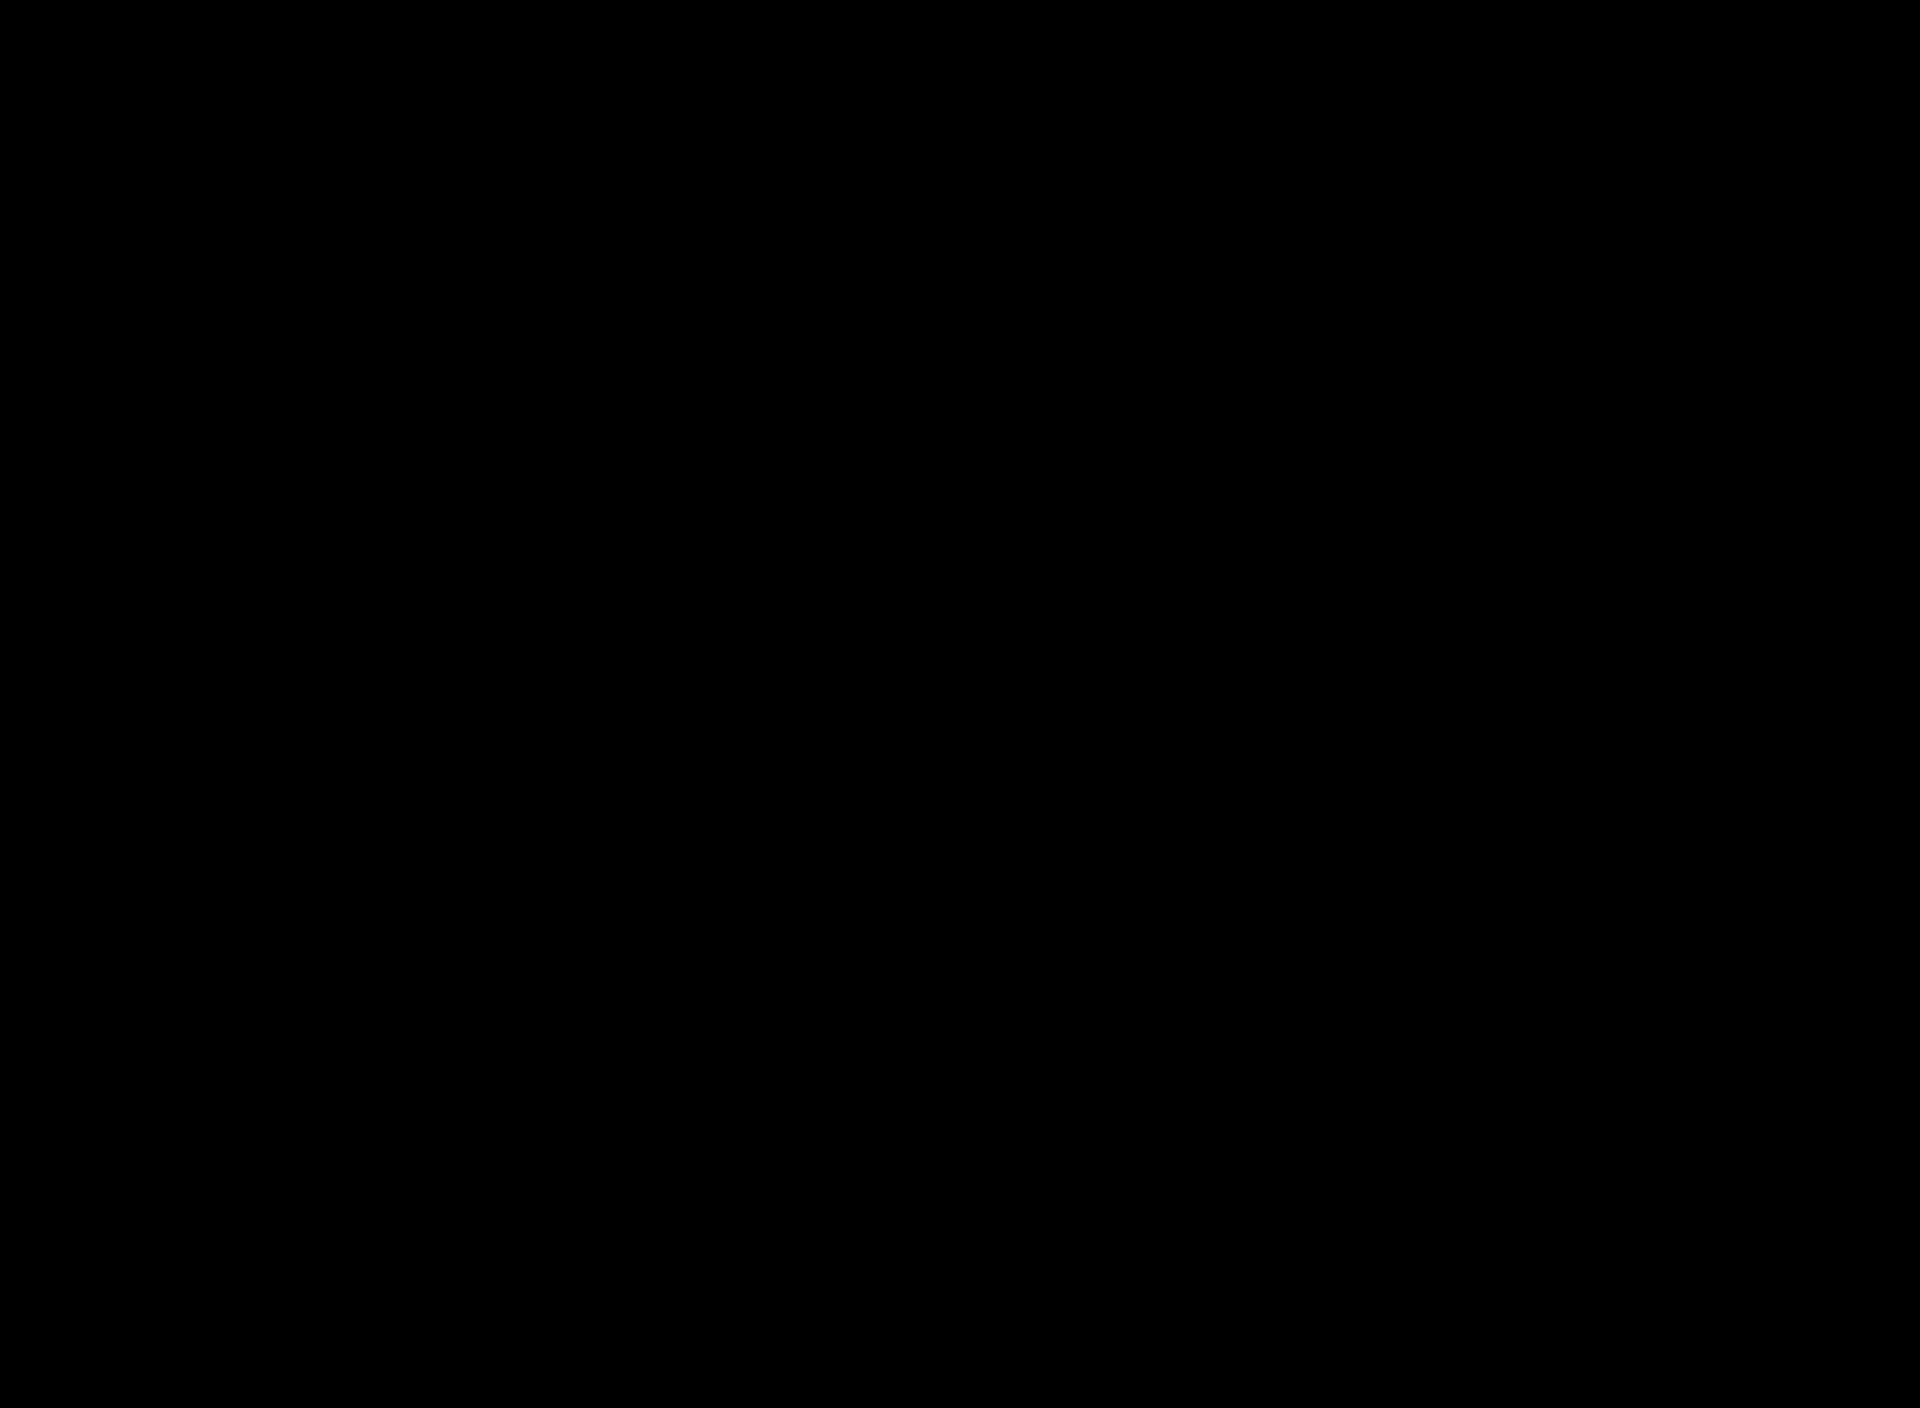 LC tank circuit